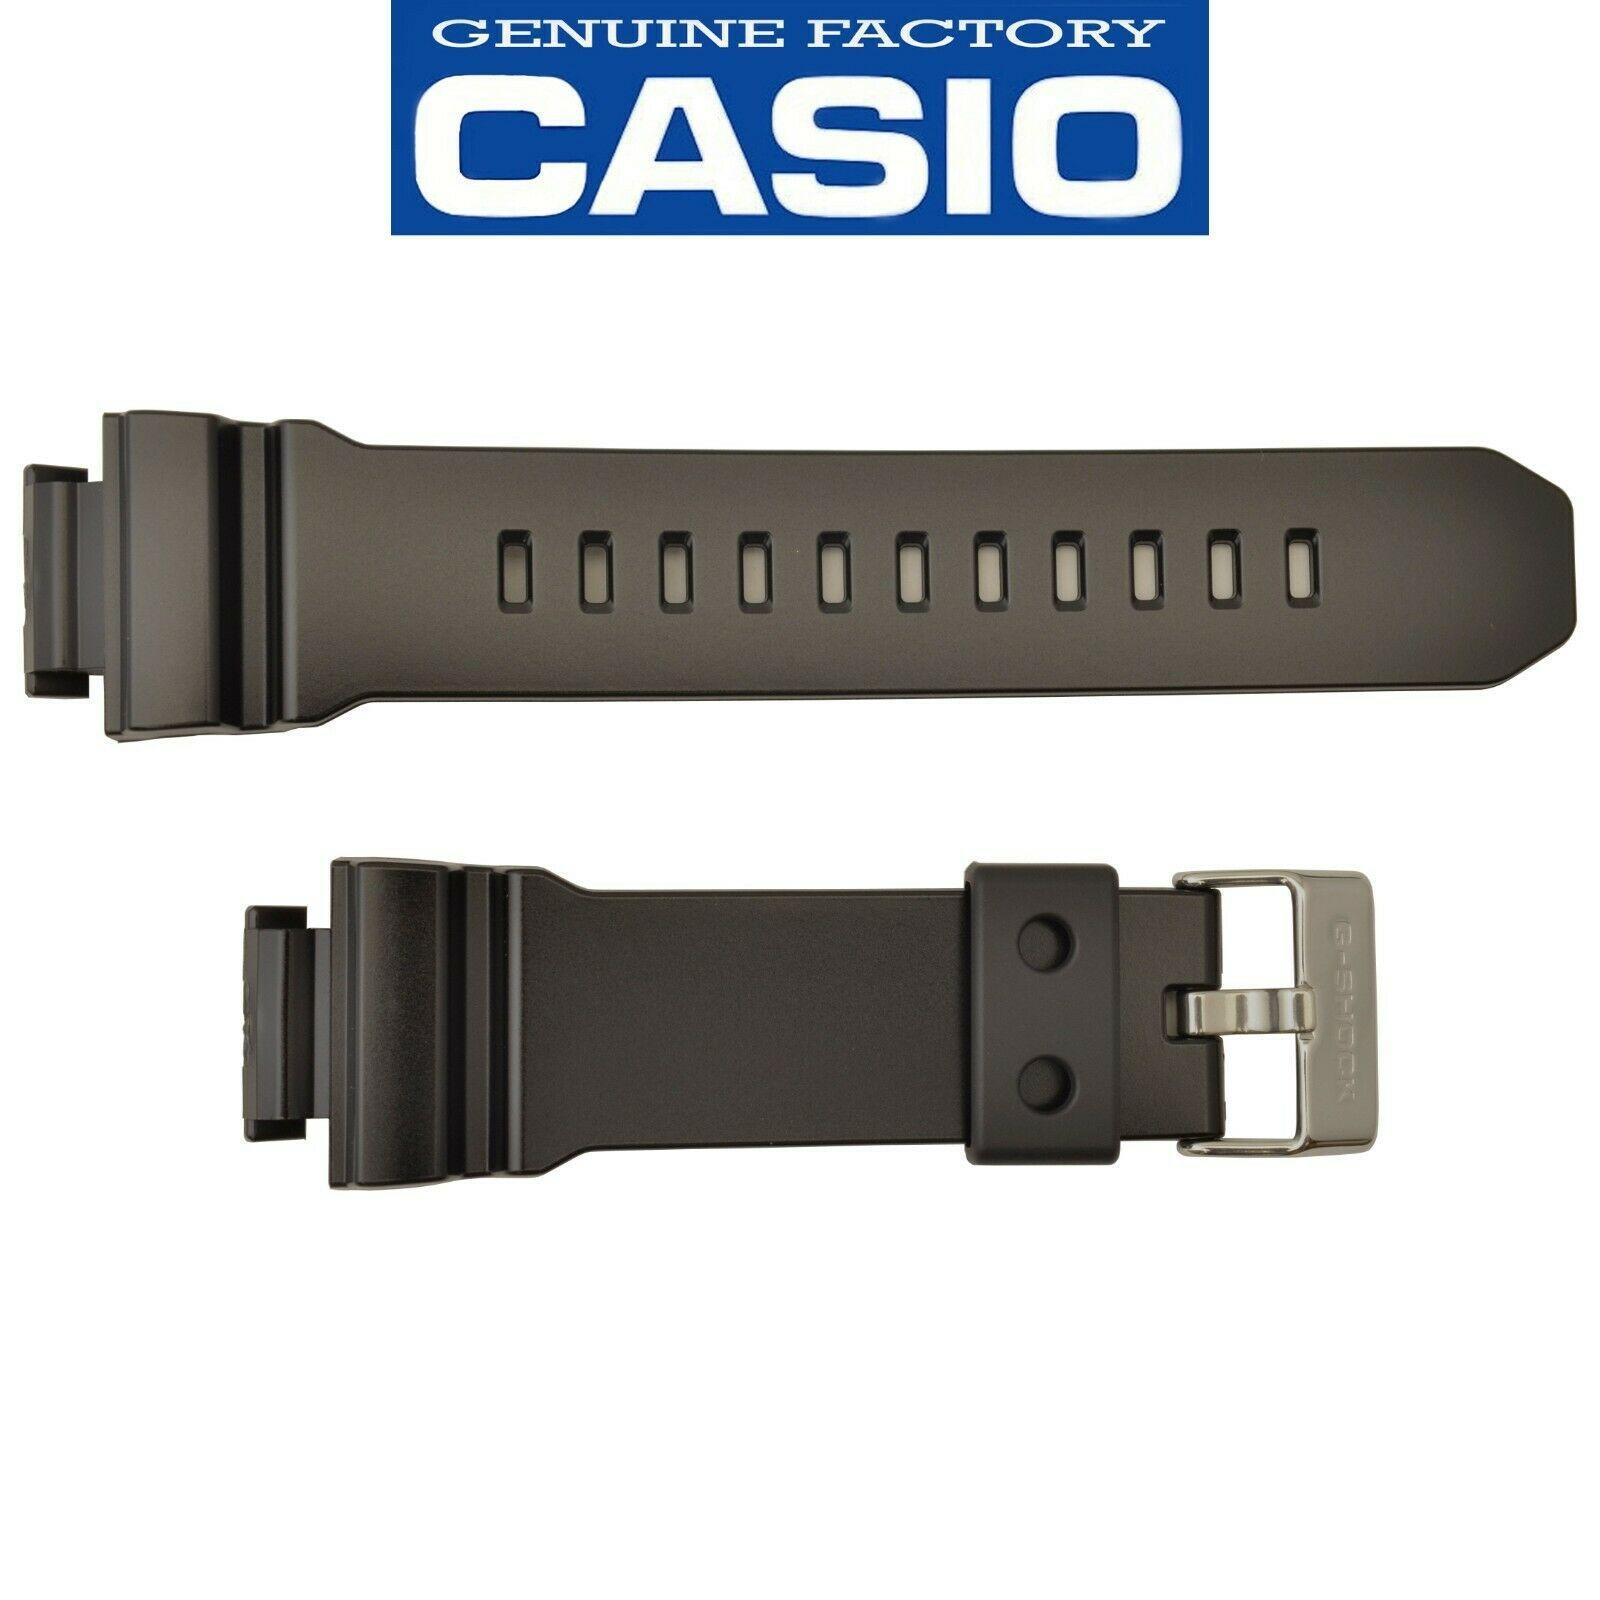 Genuine CASIO G-SHOCK Watch Band Strap GBX-6900B-1 Original Black Rubber - $31.10